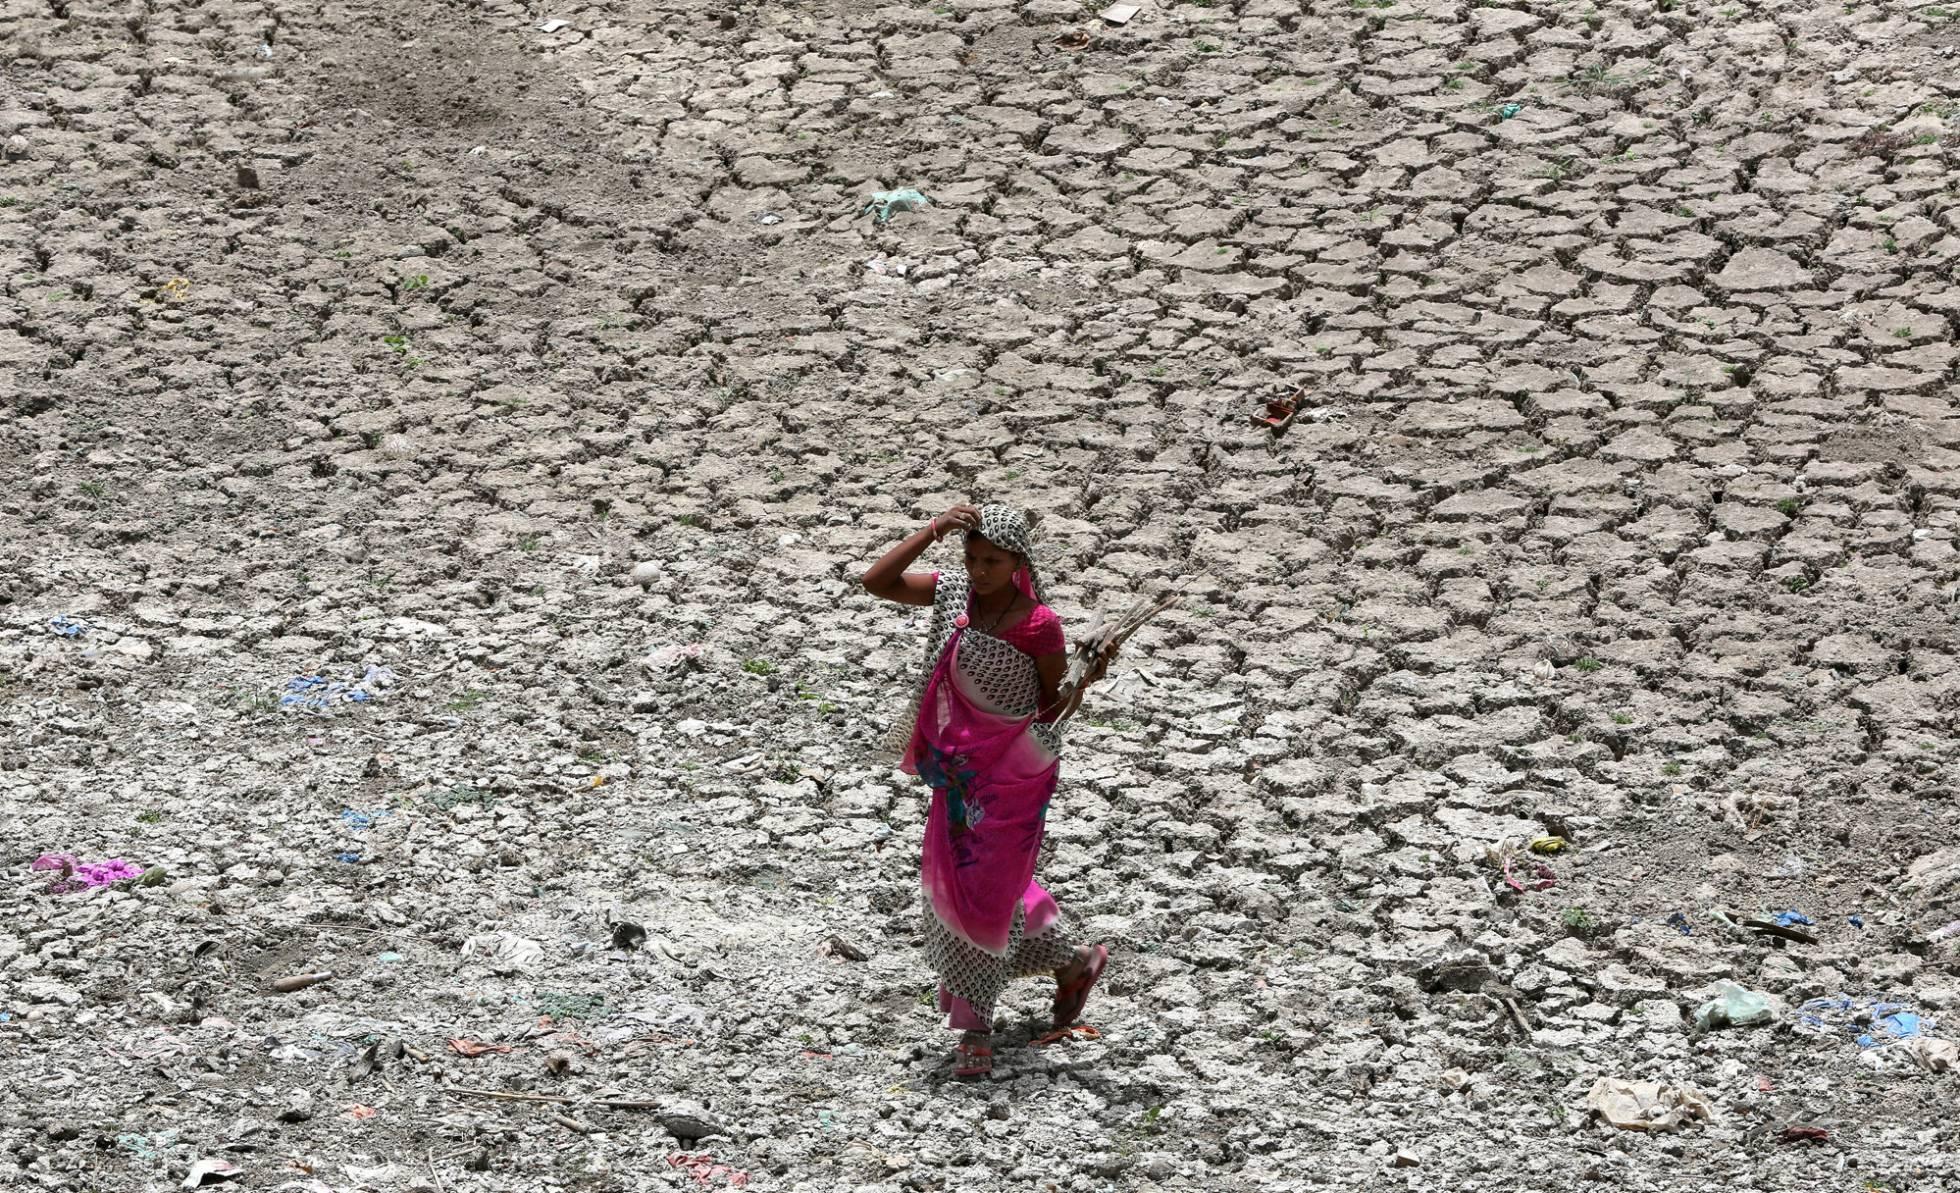 La Tierra acumula 400 meses seguidos de temperaturas superiores a la media histórica